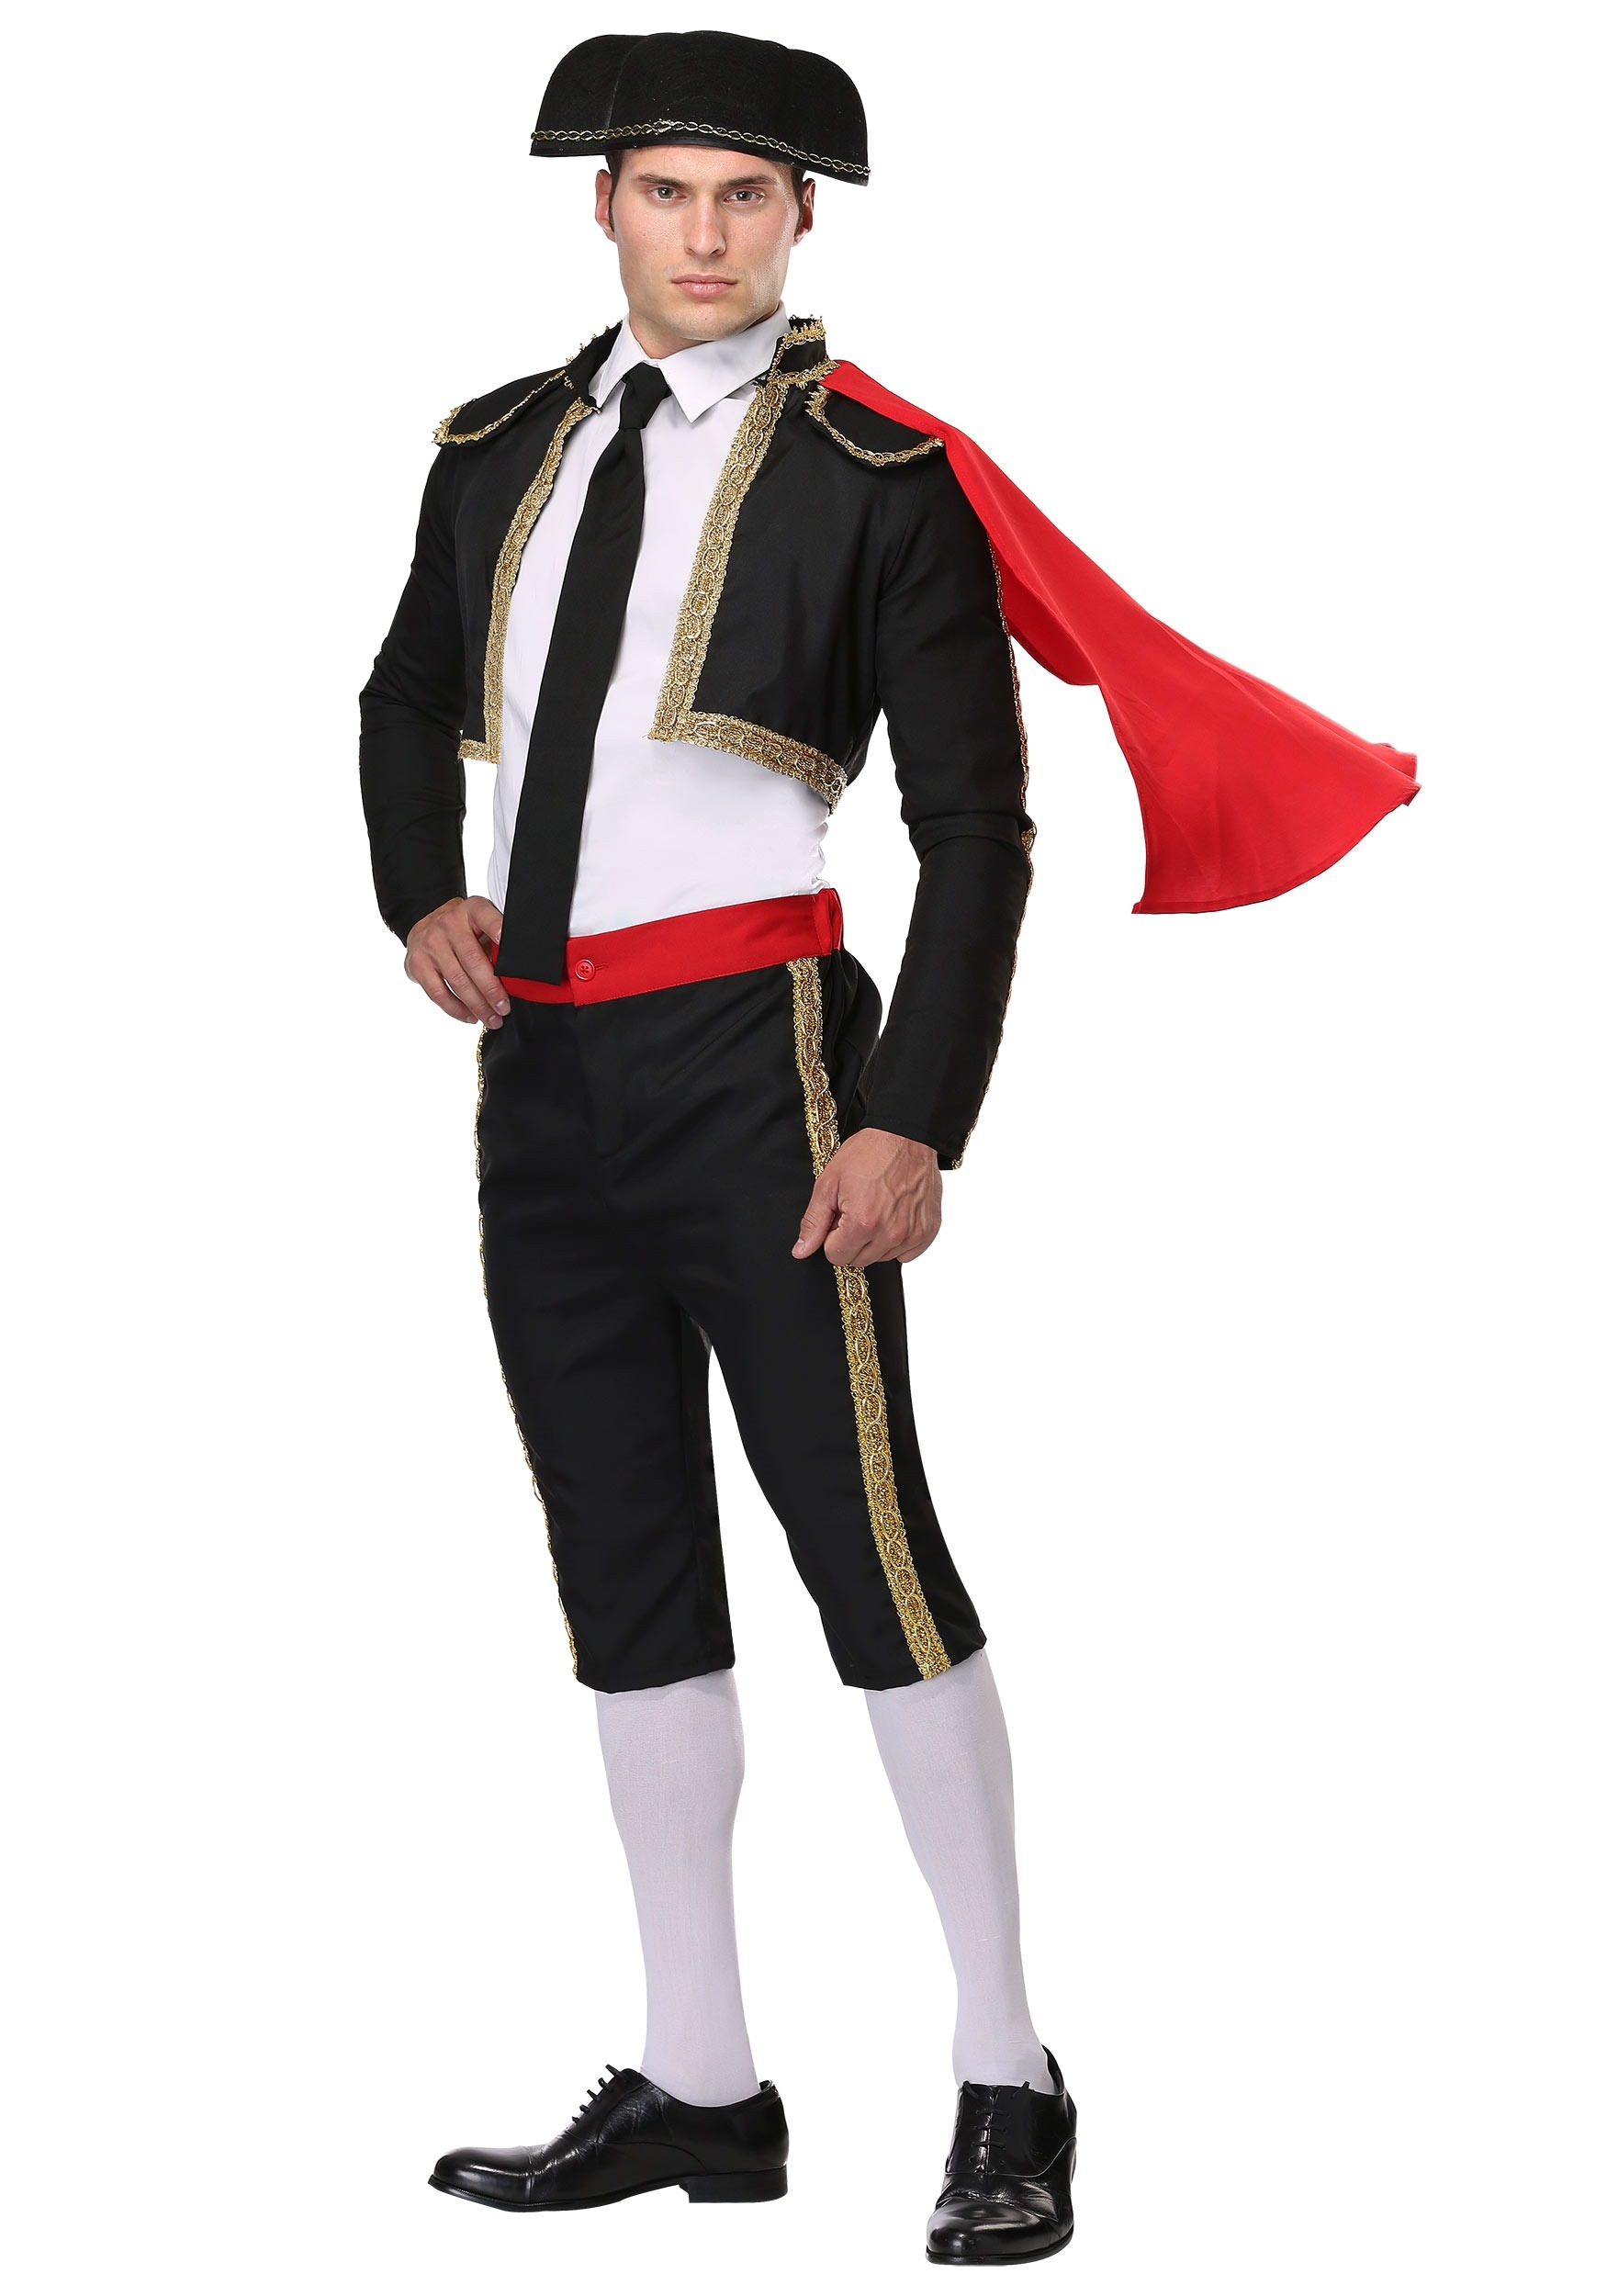 Mighty Matador Costume for Men